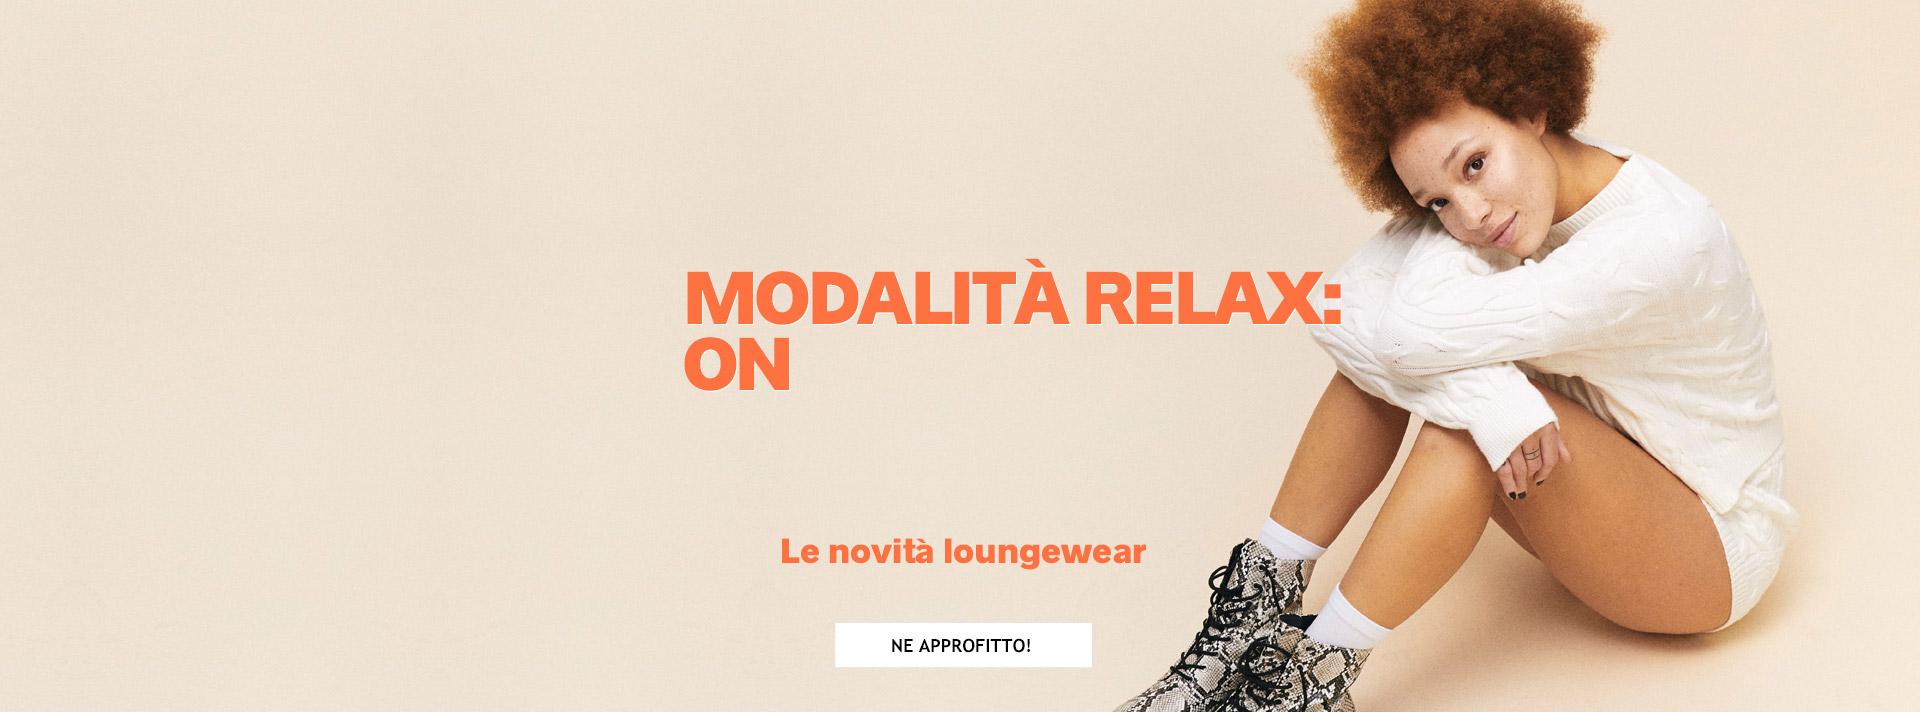 le novita loungewear